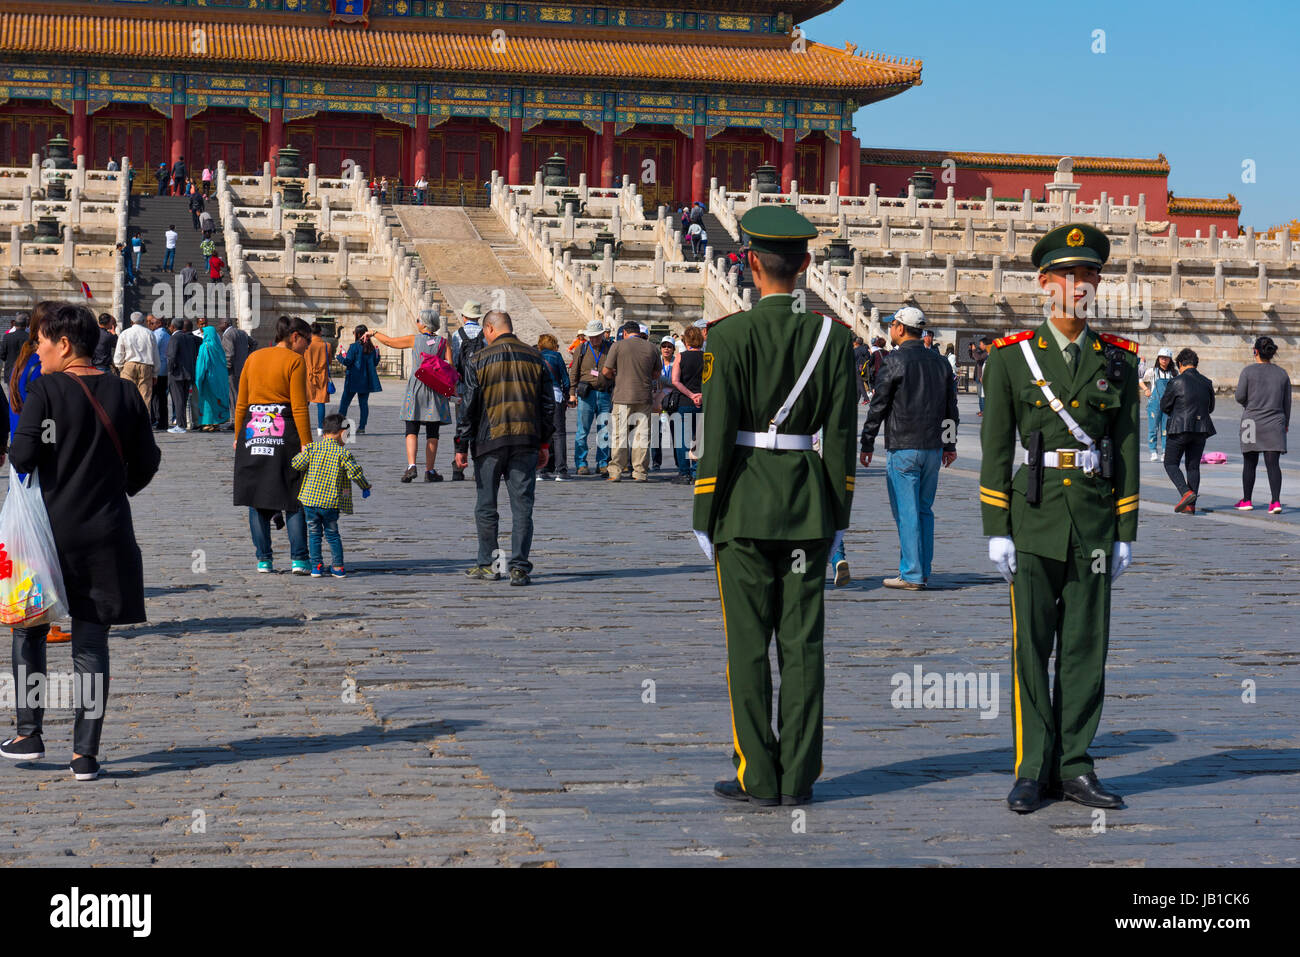 Soldaten bewachen in der verbotenen Stadt in Peking Stockbild